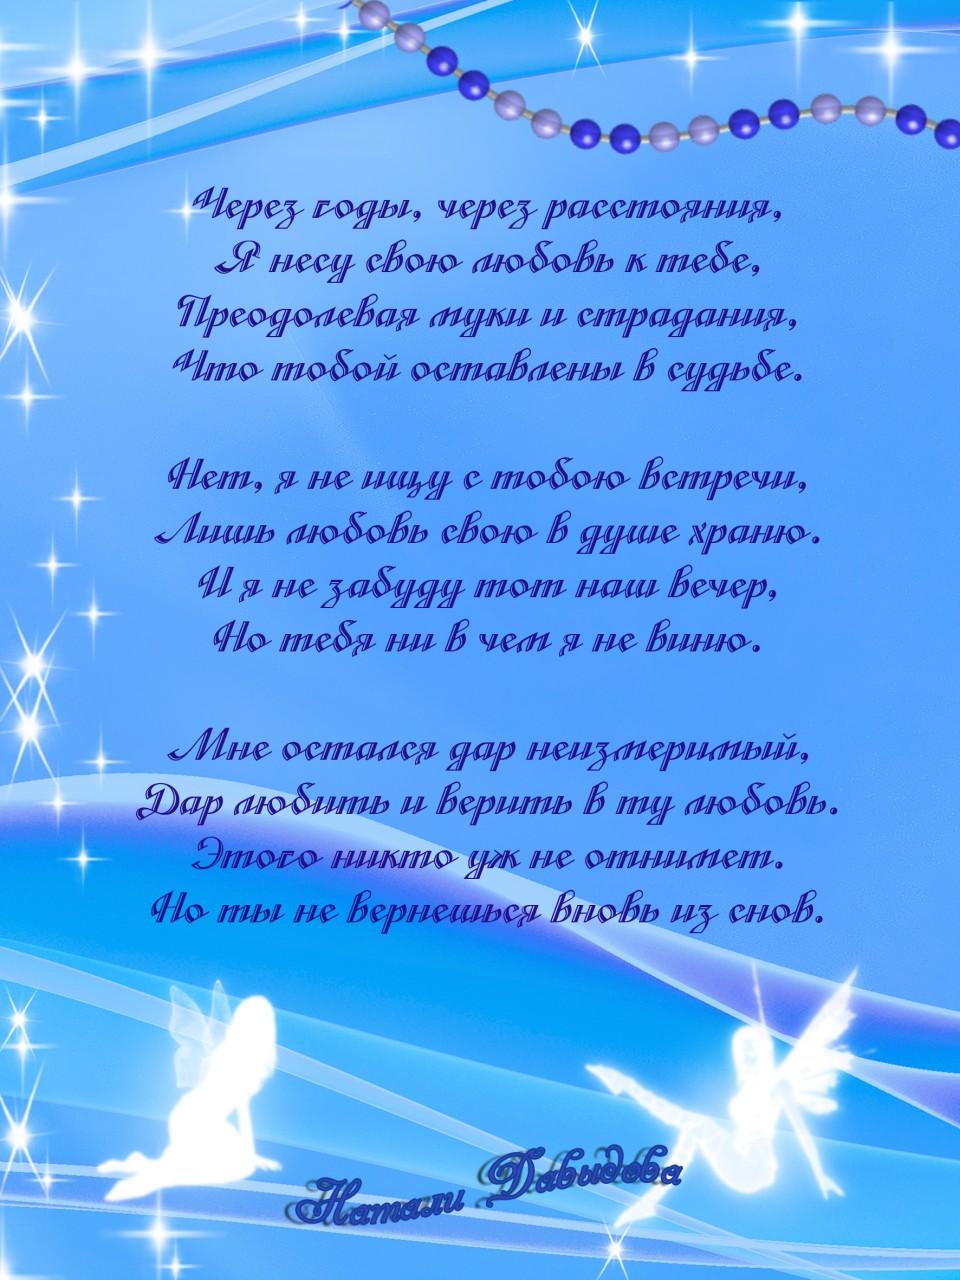 Пара стихи стихотворение стишки